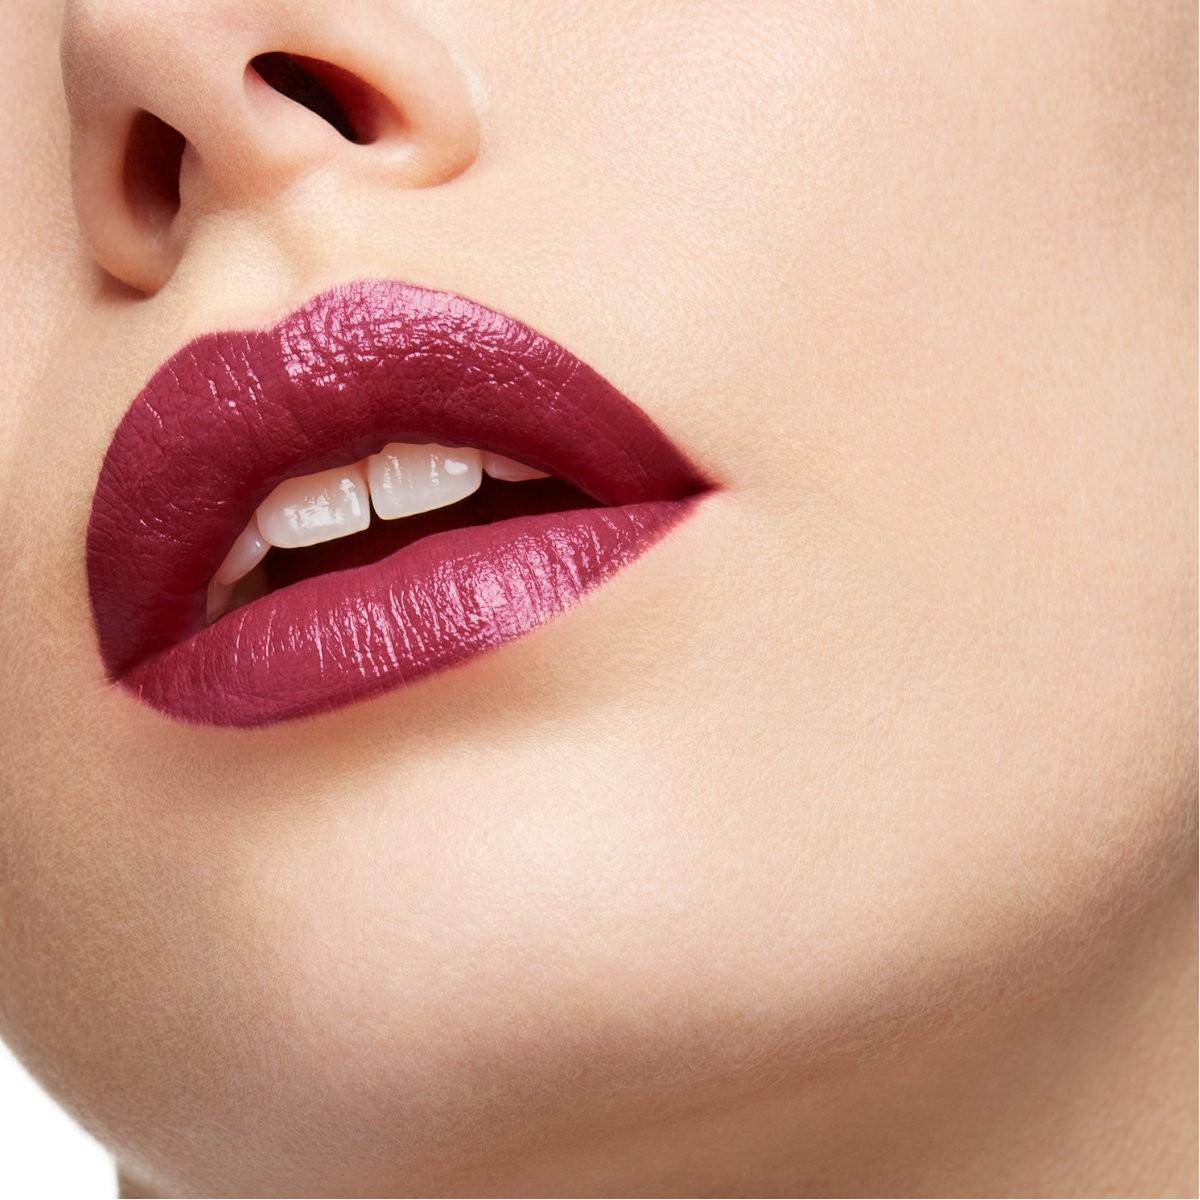 Woman Beauty - リップカラー セヴィジャーナ 400 - Christian Louboutin